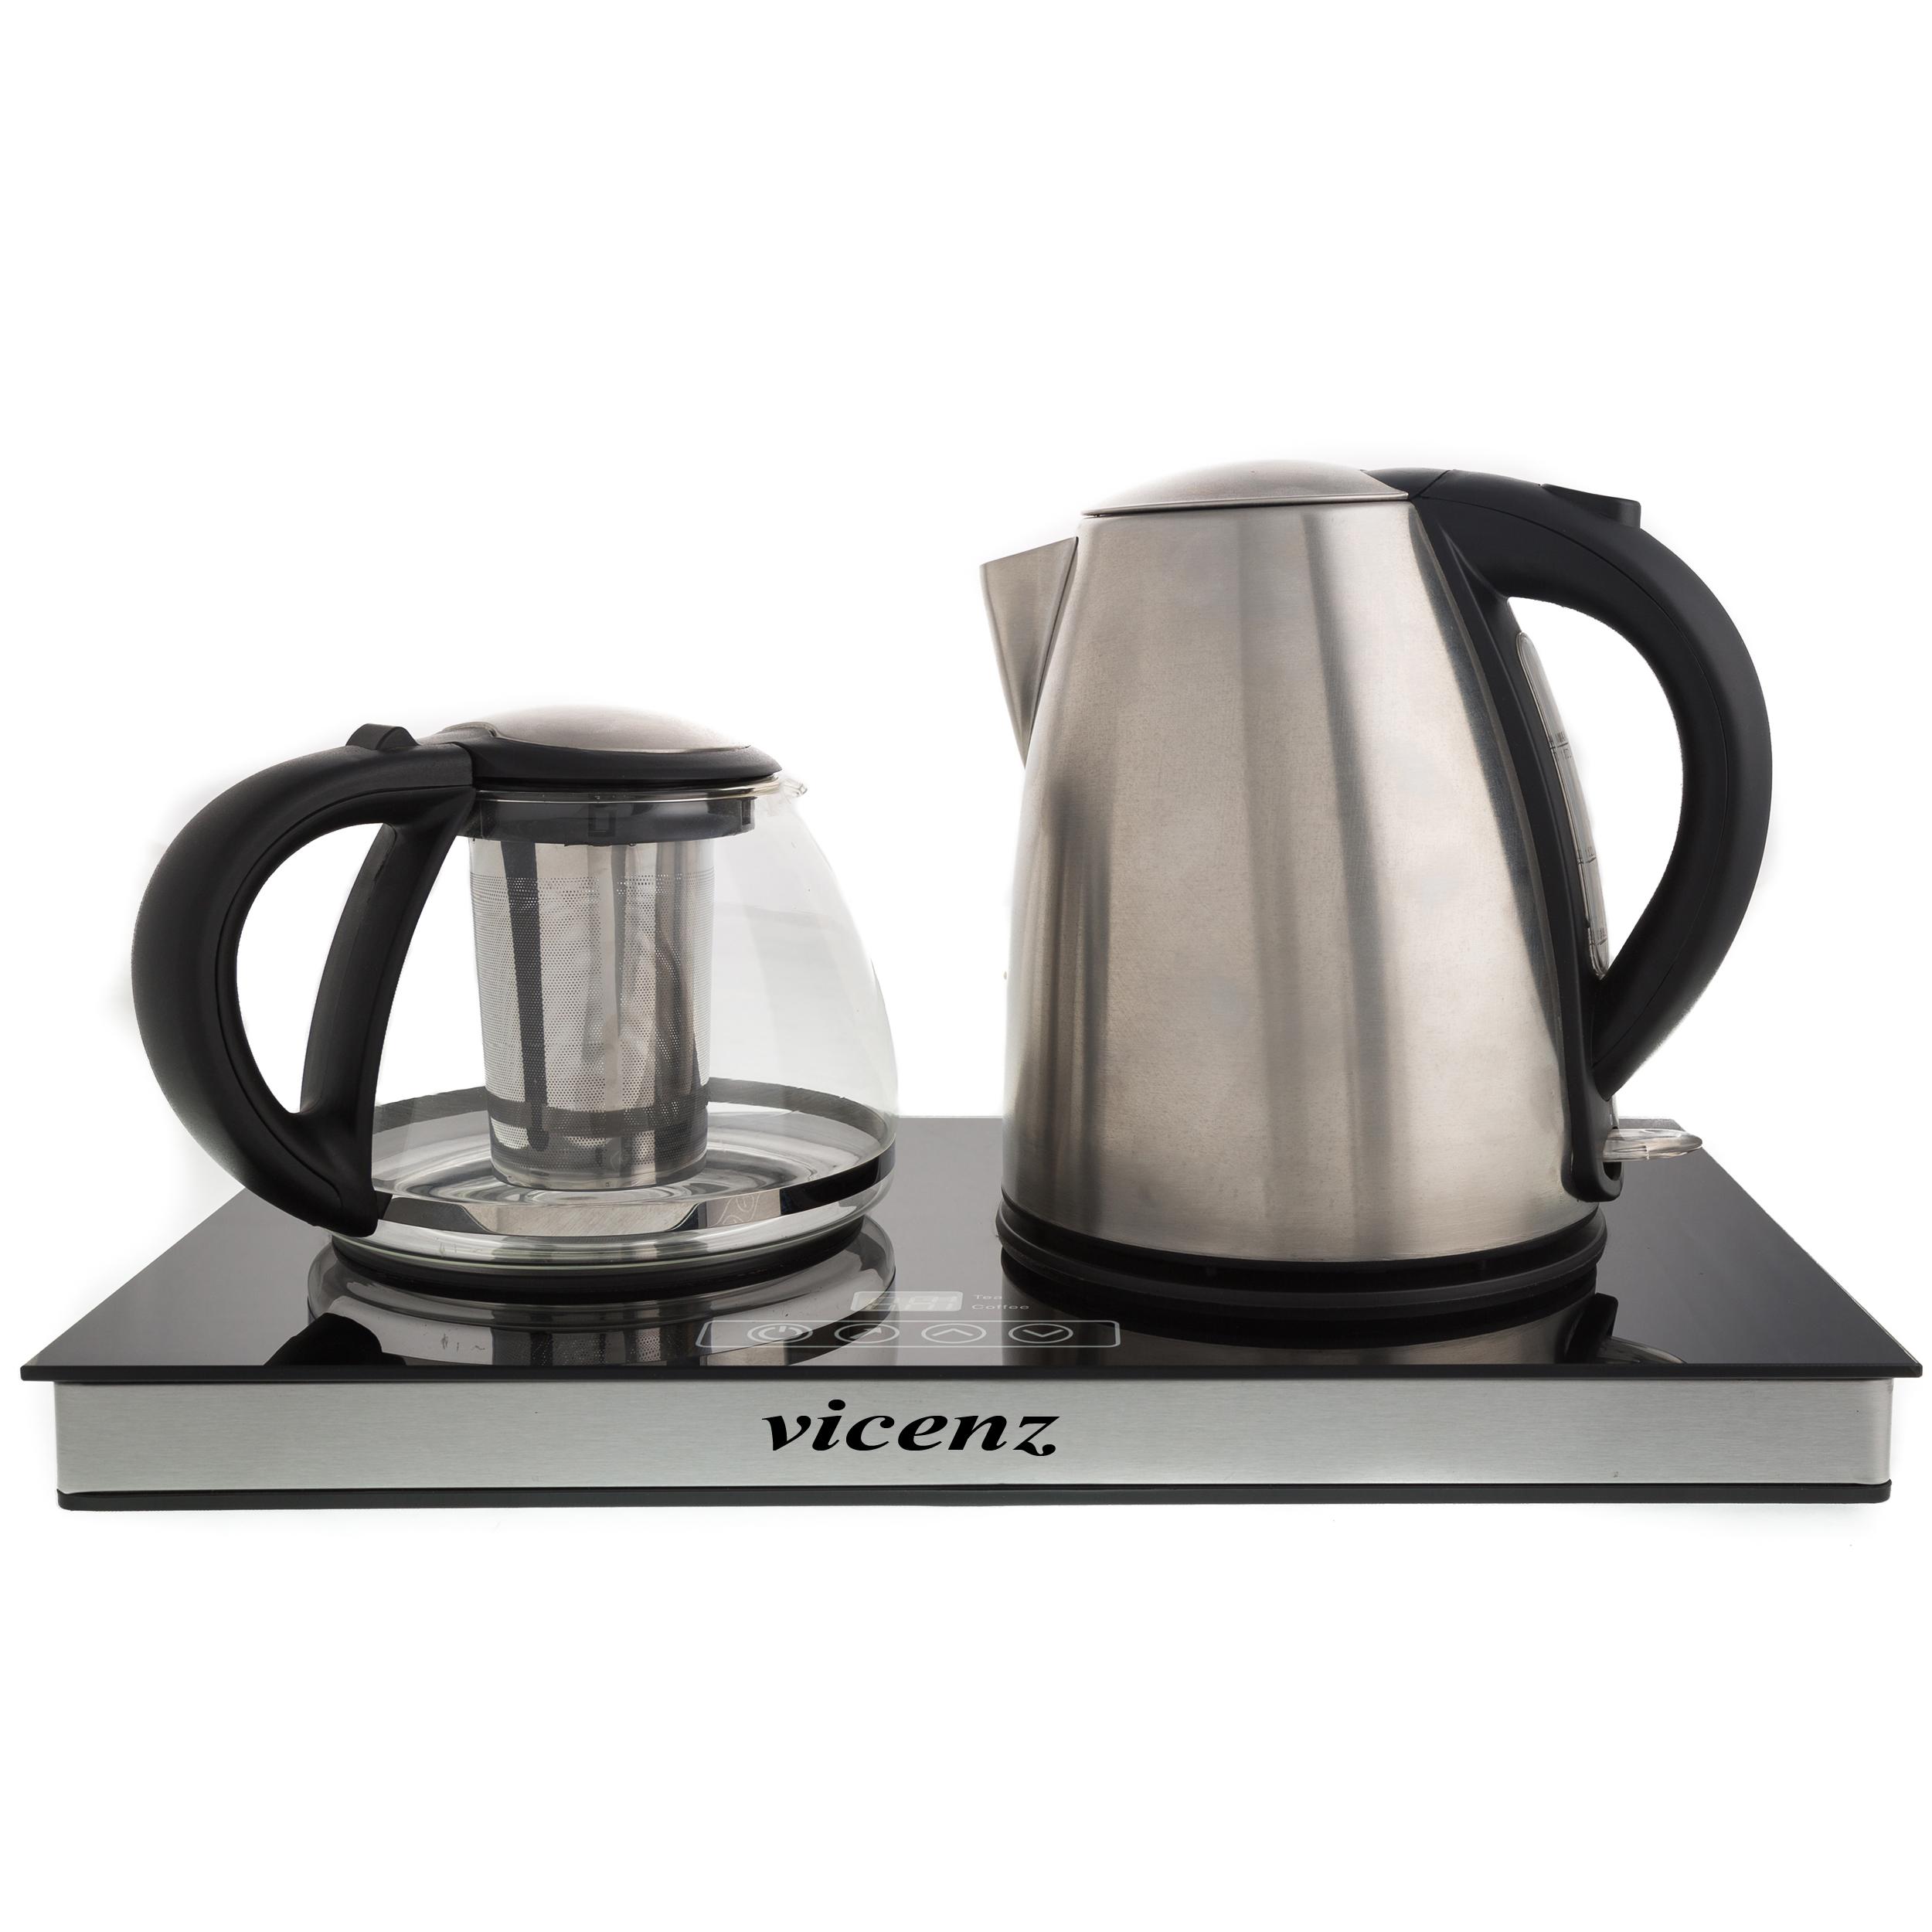 چای ساز ویکنز مدل VIC-440